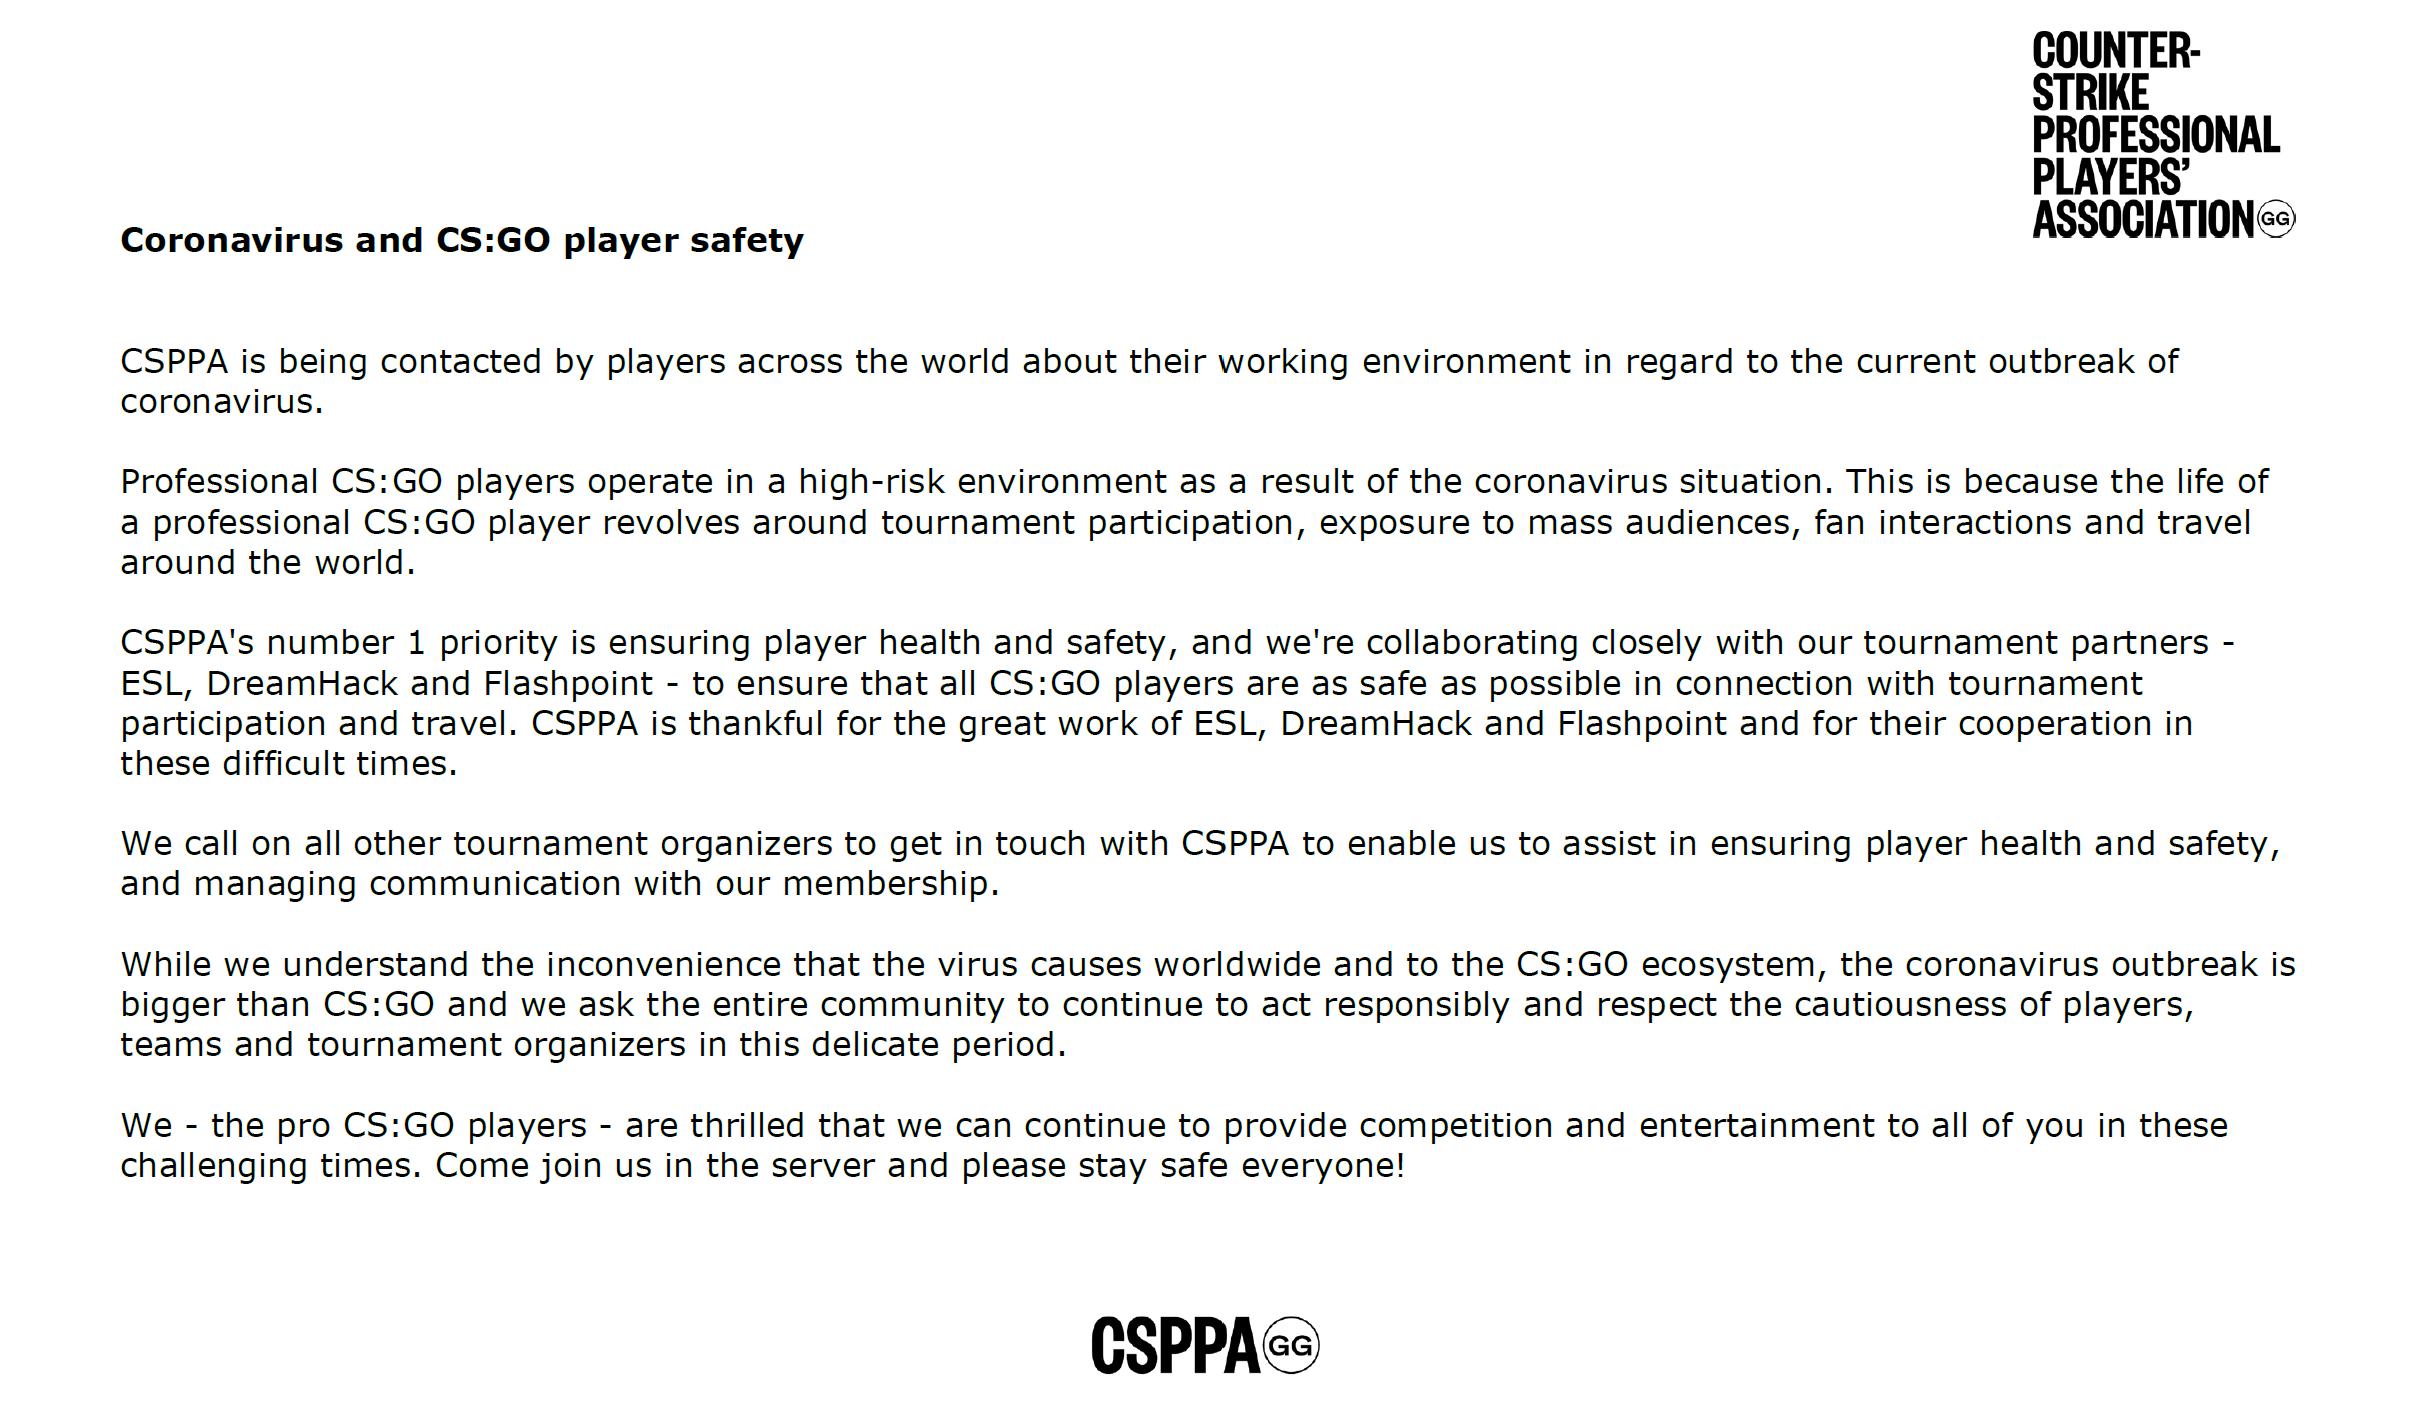 CSPPA发文致谢主办方的付出,呼吁严肃对待疫情爆发